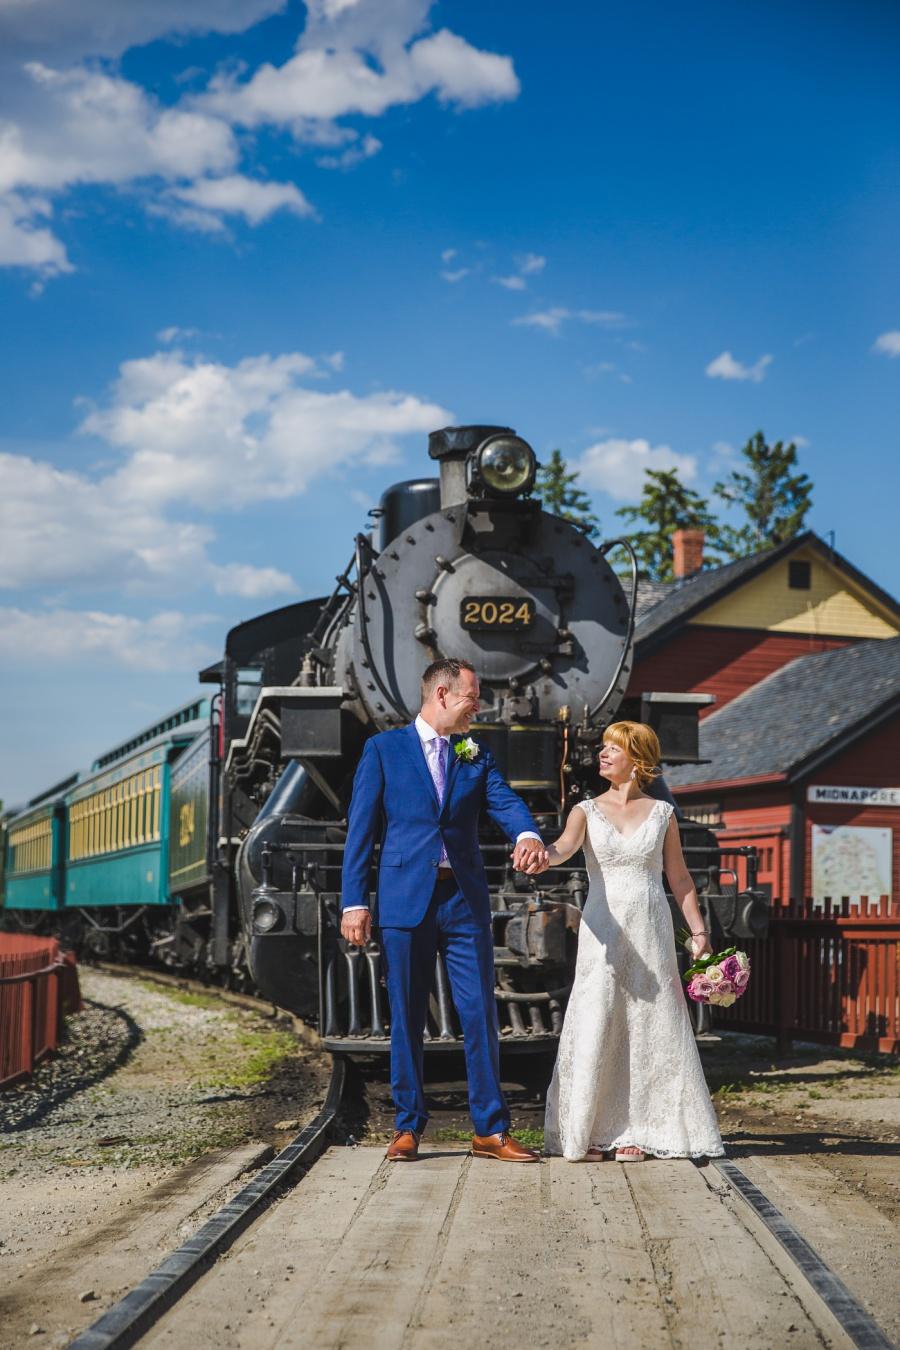 st. martin's church heritage park wedding calgary train antique